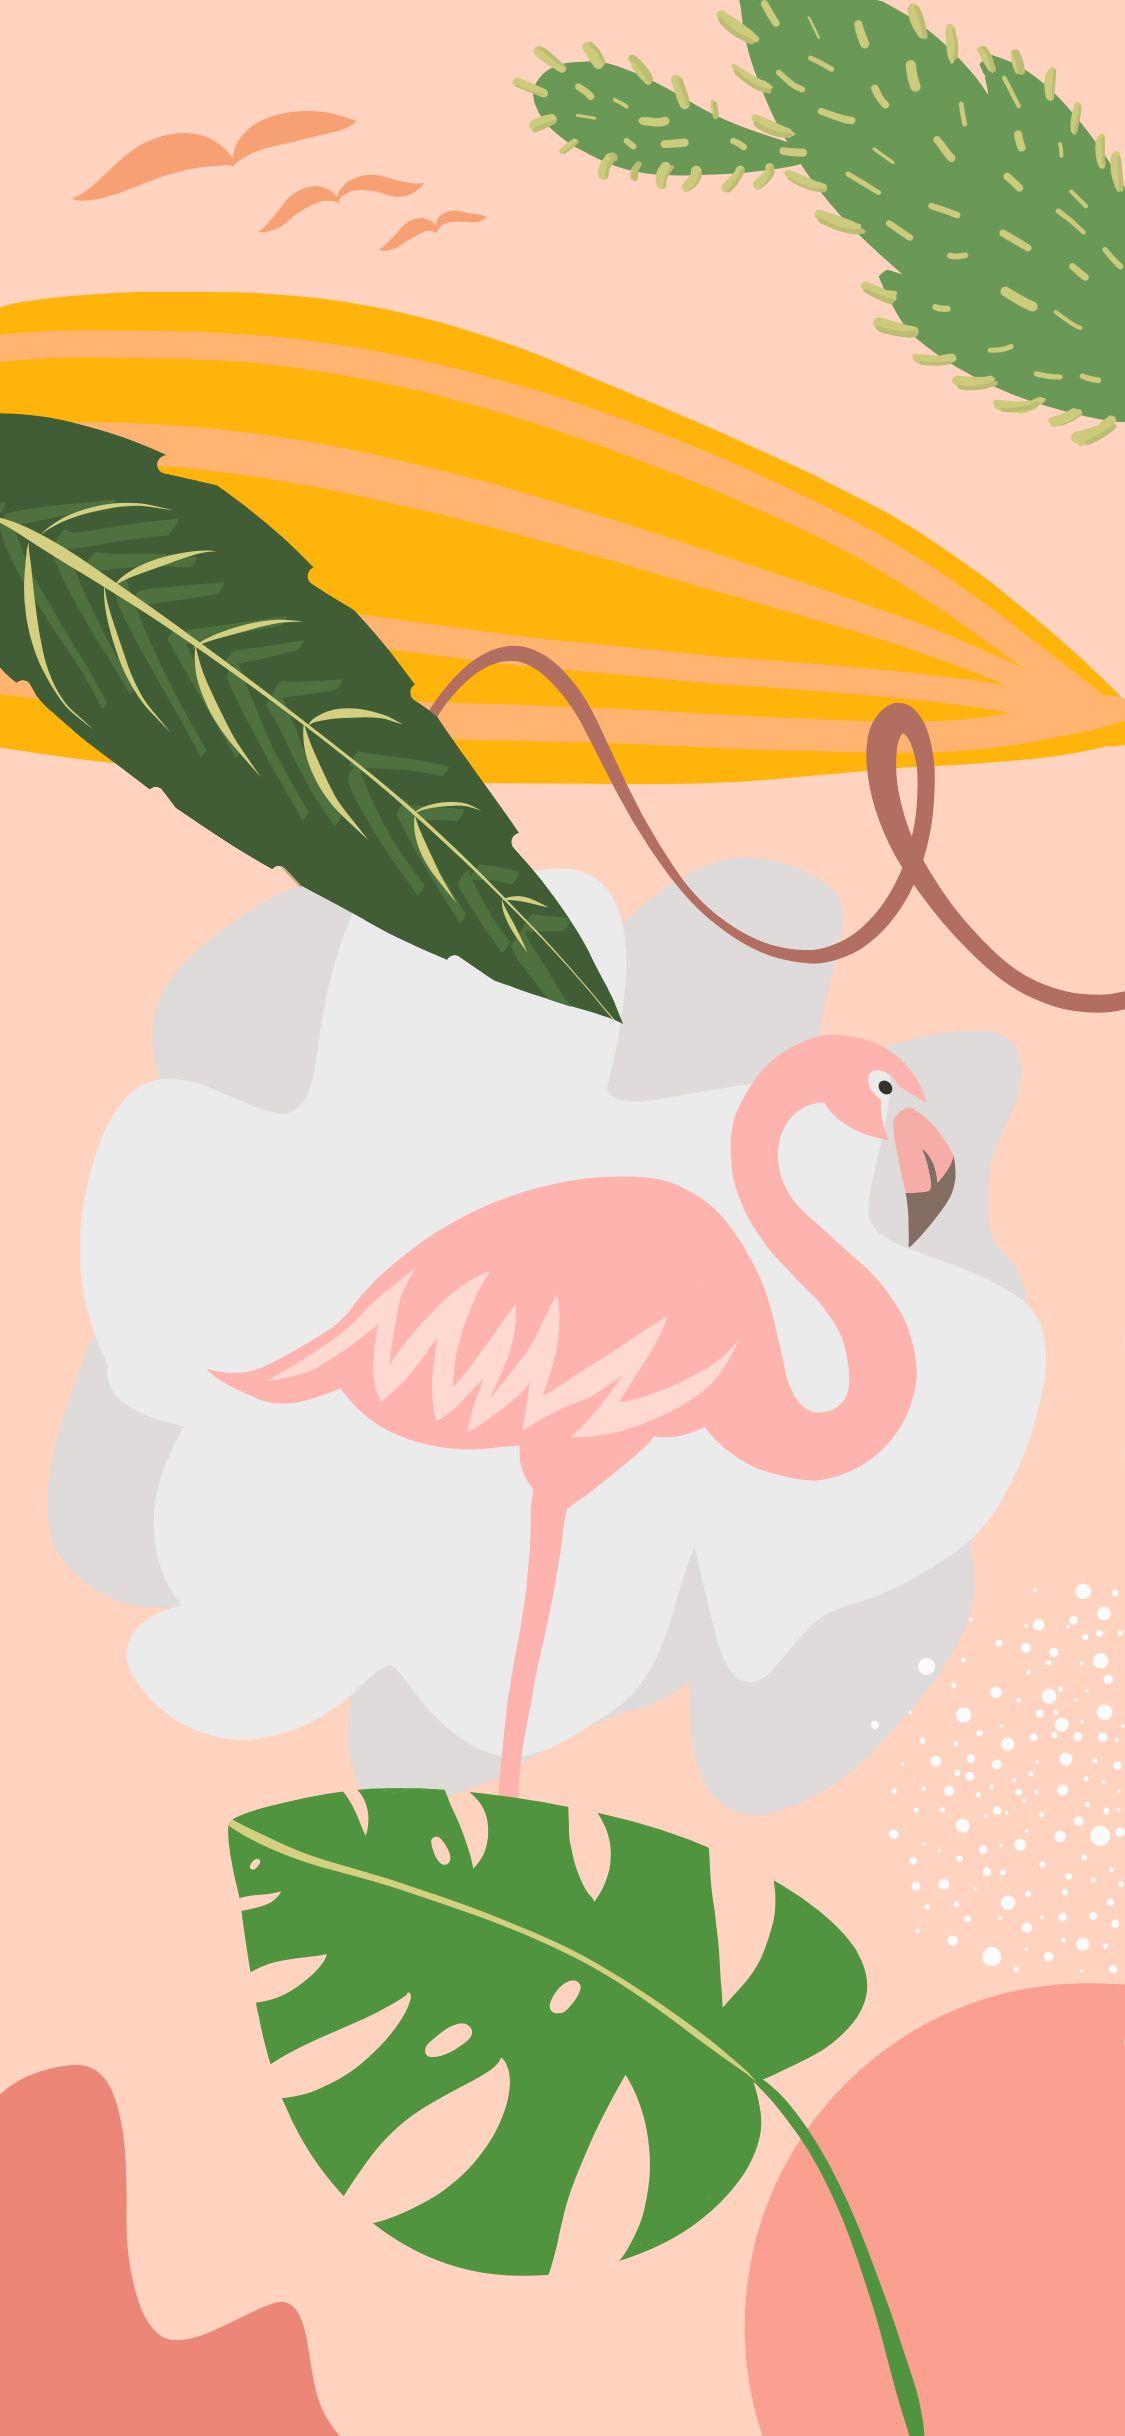 Illustration Flamingo Plant Wallpaper Lukisan Flamingo Ilustrasi Foto Abstrak